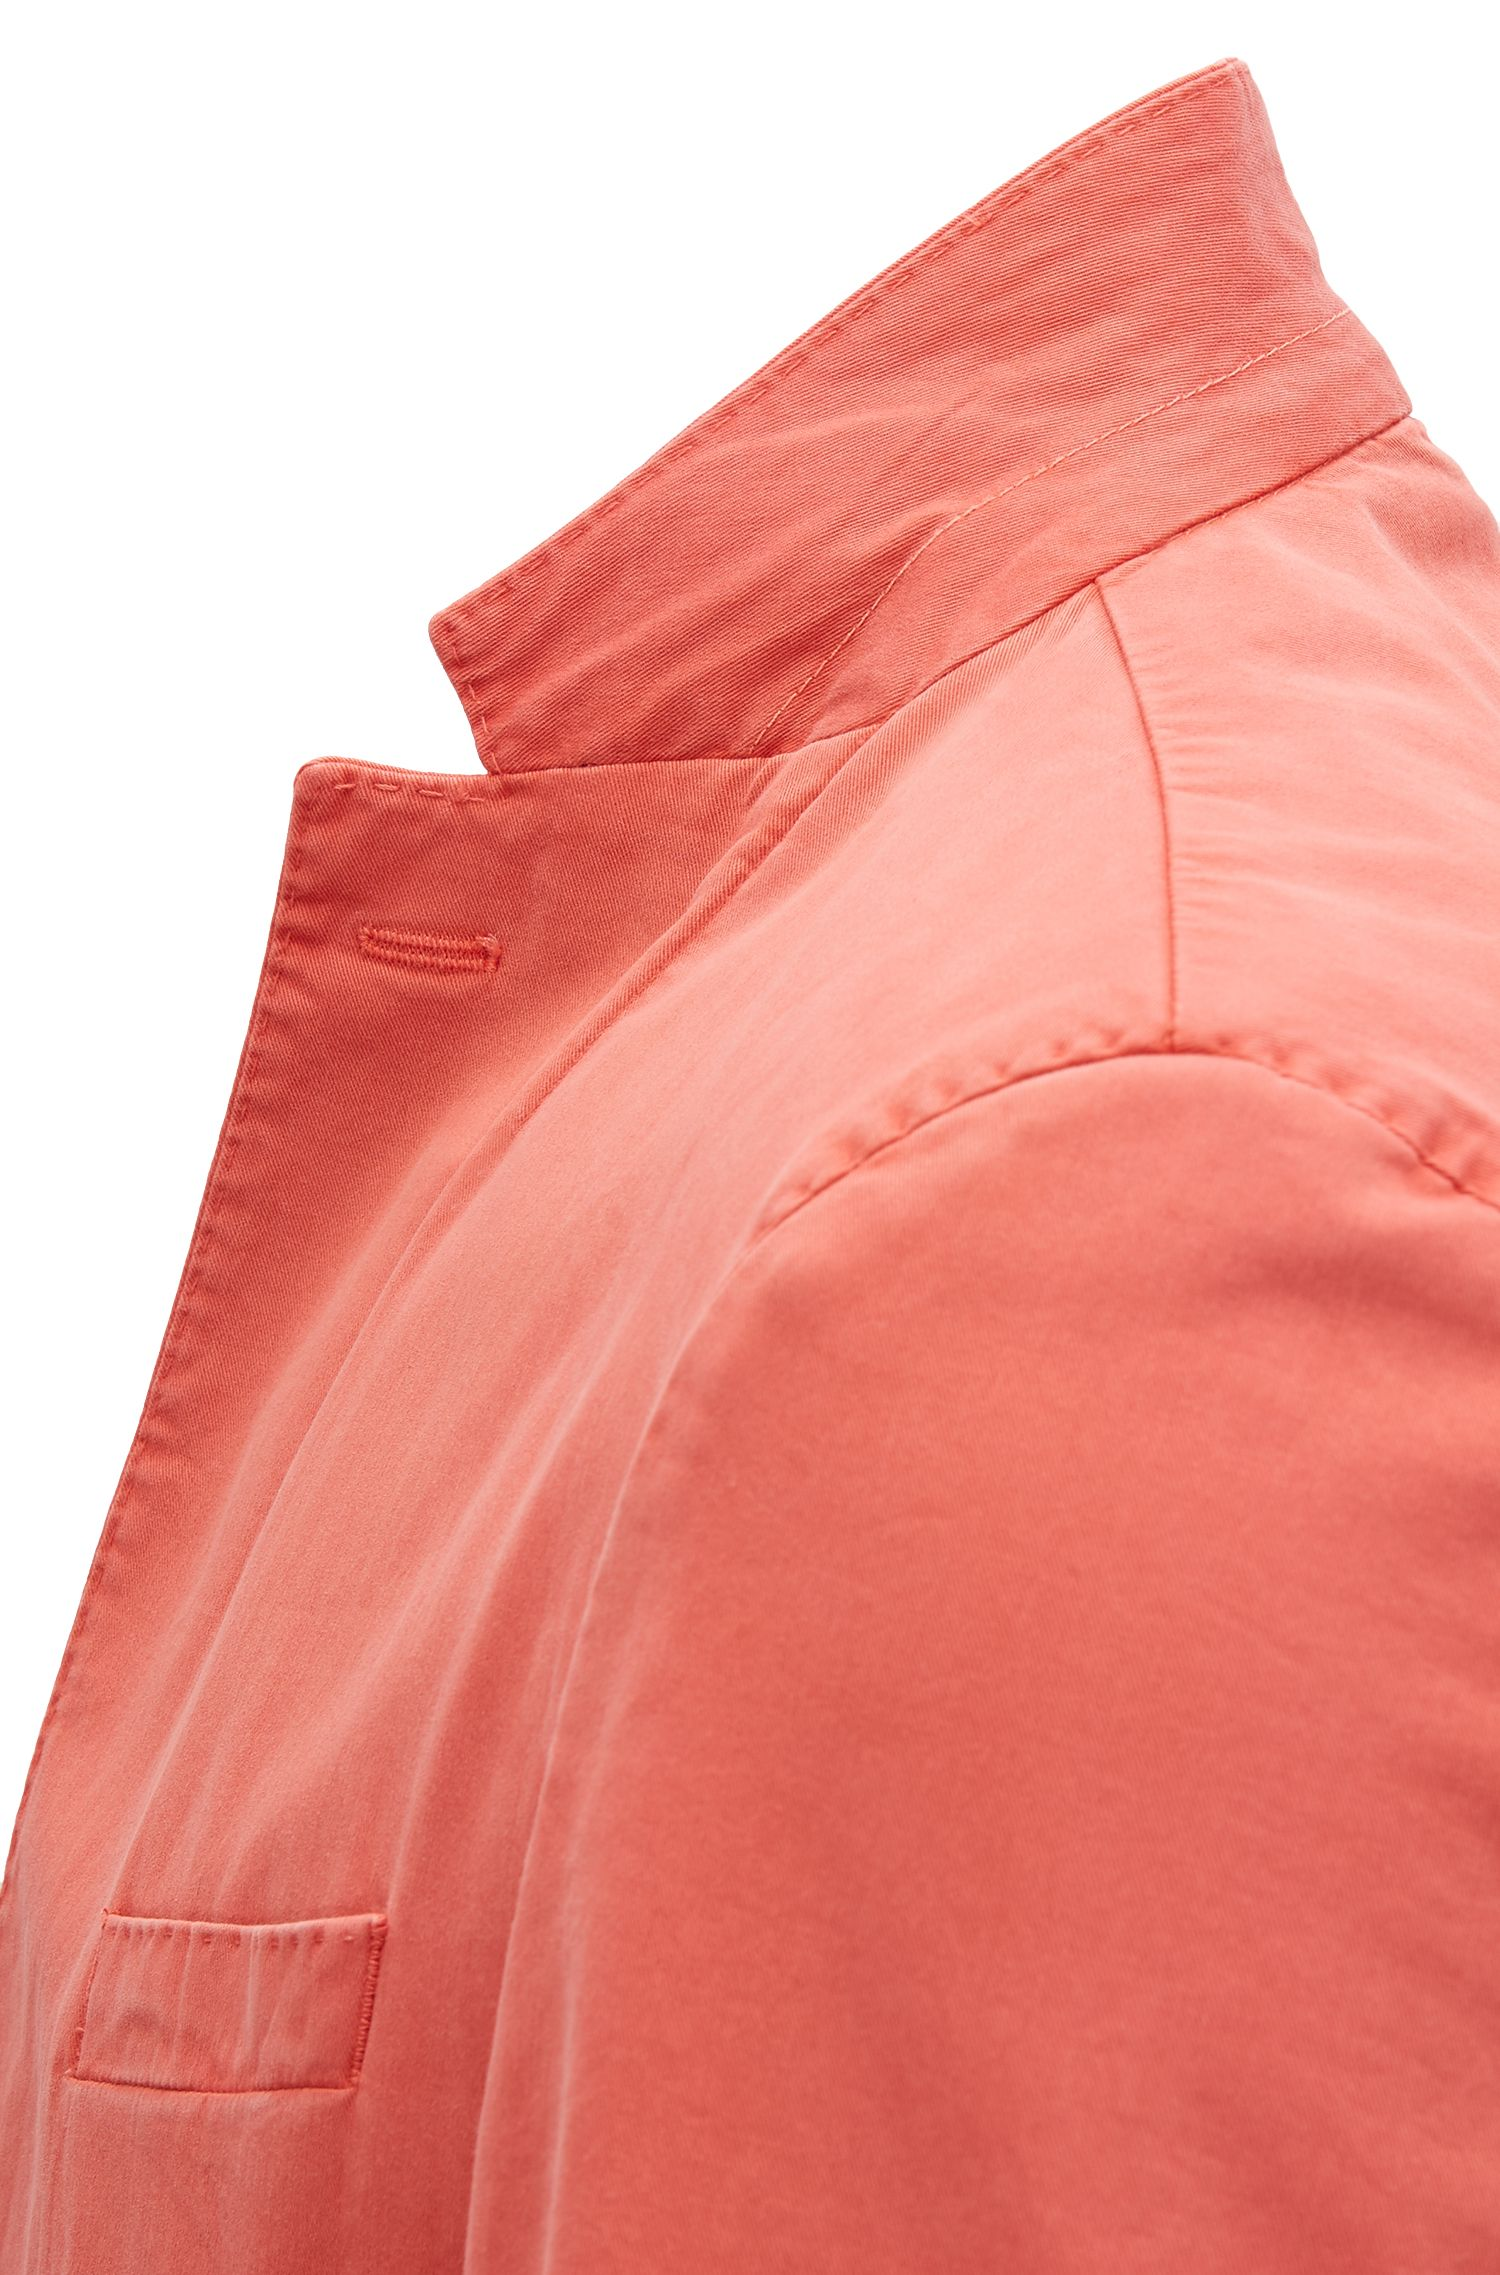 Garment-Dyed Stretch Cotton Sport Coat, Slim Fit | Hanry D, Dark Orange